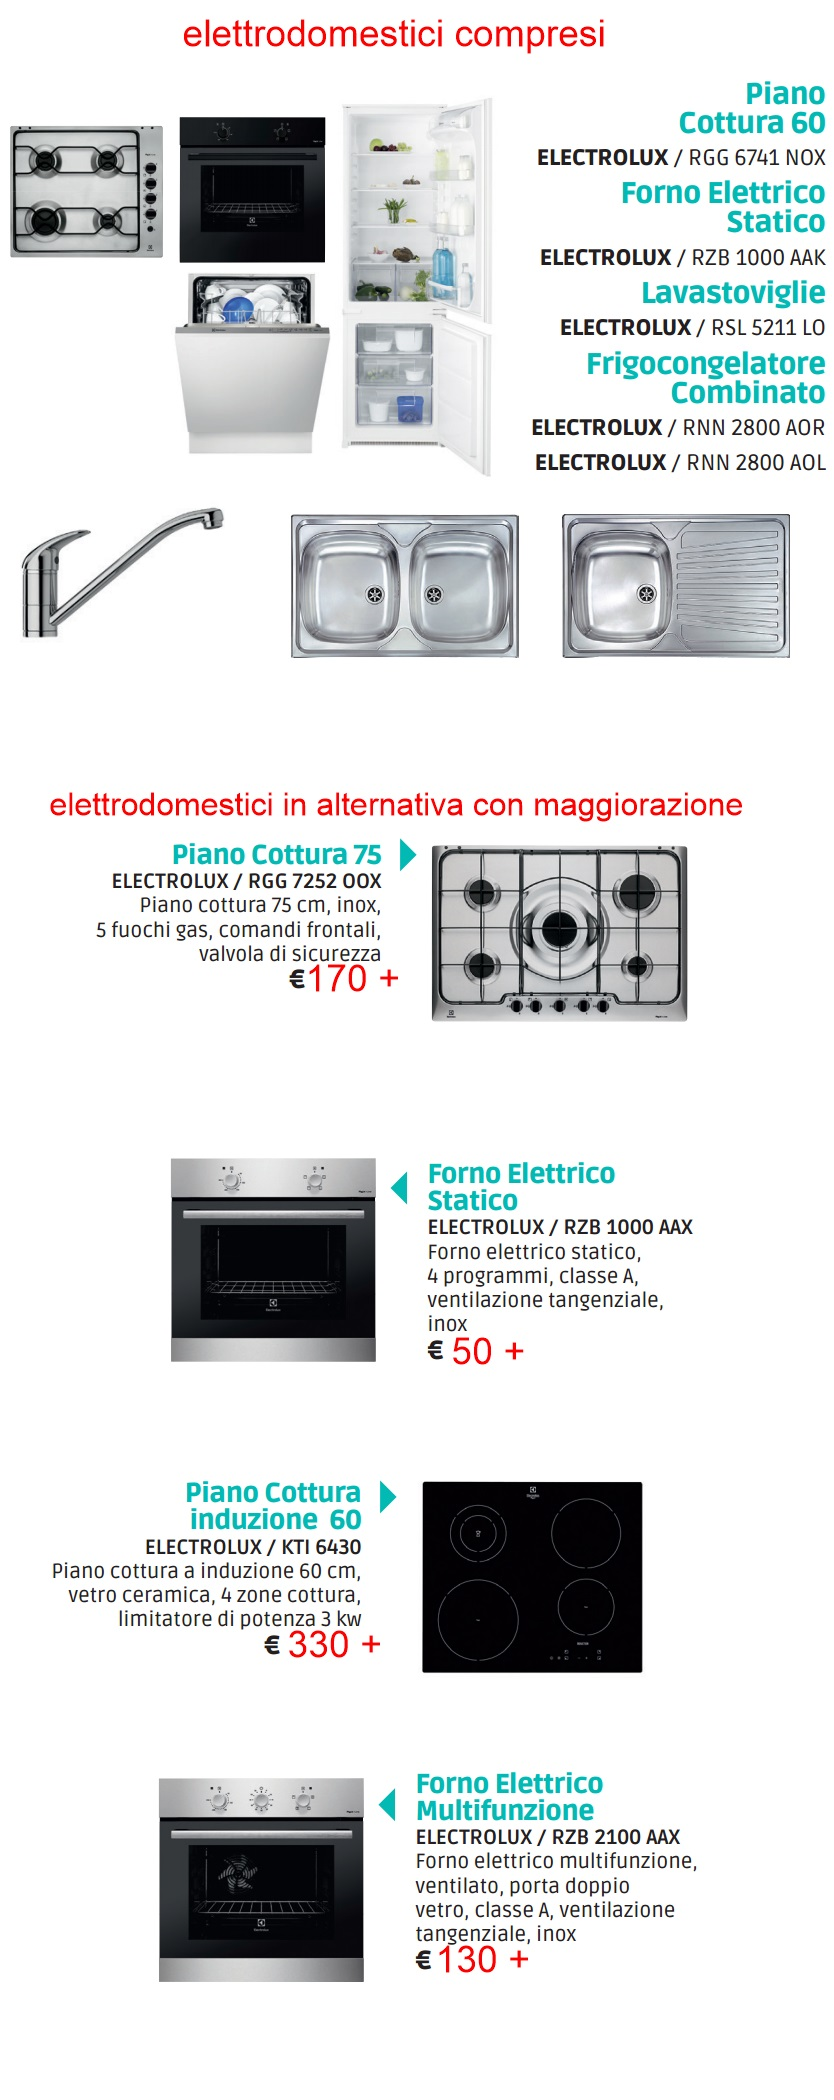 scheda_elettrodomestici_cucina_promo_electrolux